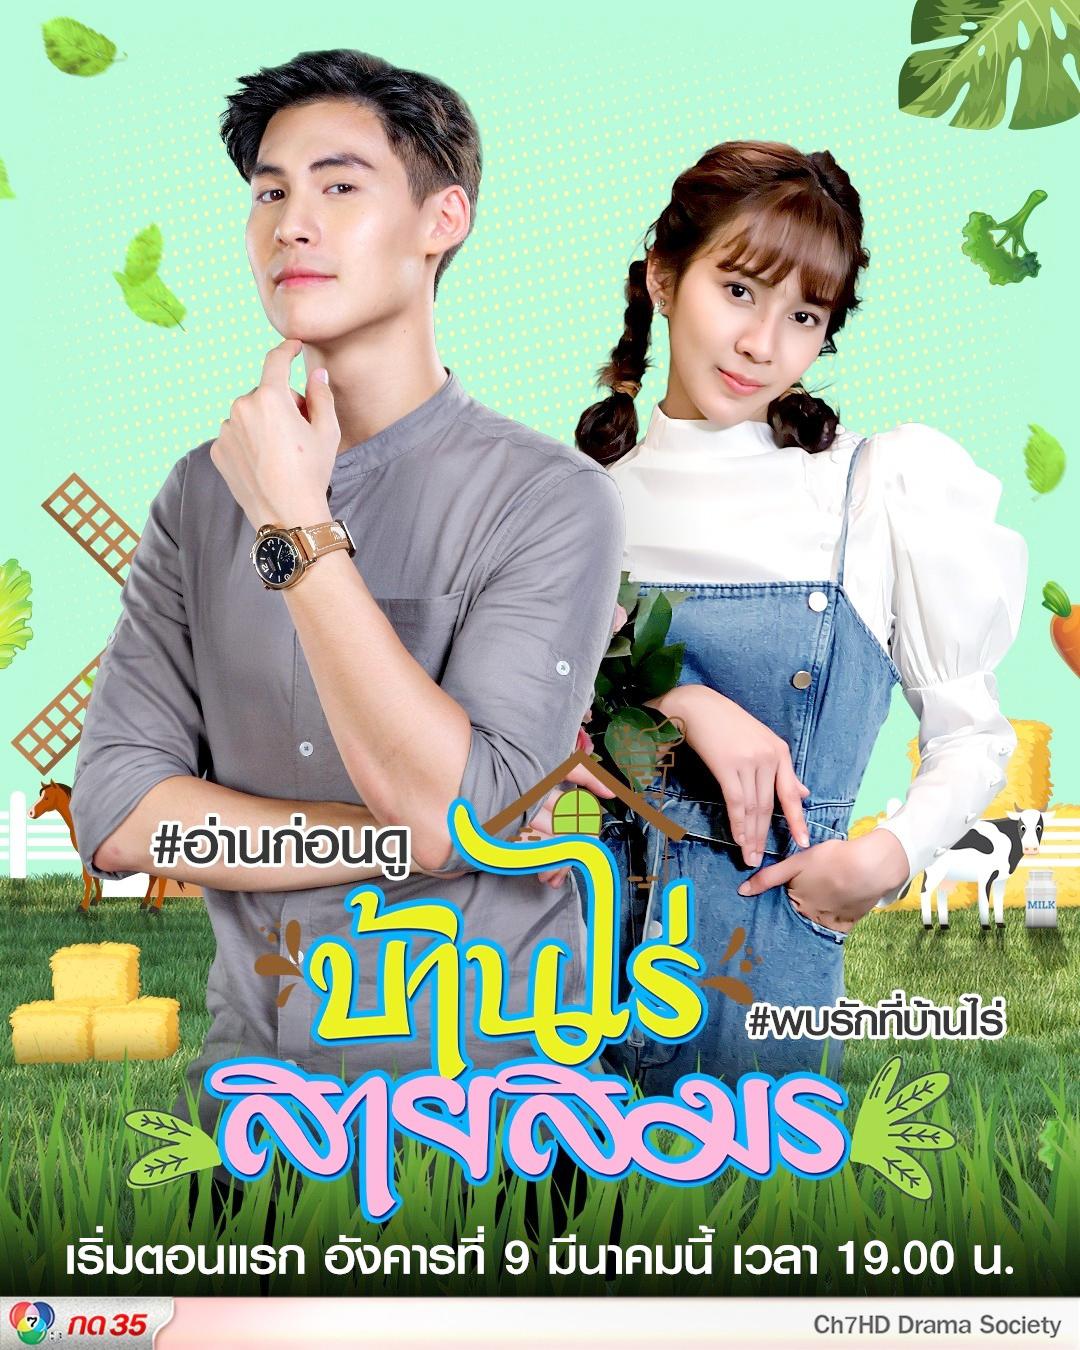 Ban Rai Sai Samorn ep 24 | บ้านไร่สายสมร | Thai Drama | thaidrama | thailakorn | thailakornvideos | thaidrama2021 | malimar tv | meelakorn | lakornsod | klook | seesantv | viu | raklakorn | dramacool Best